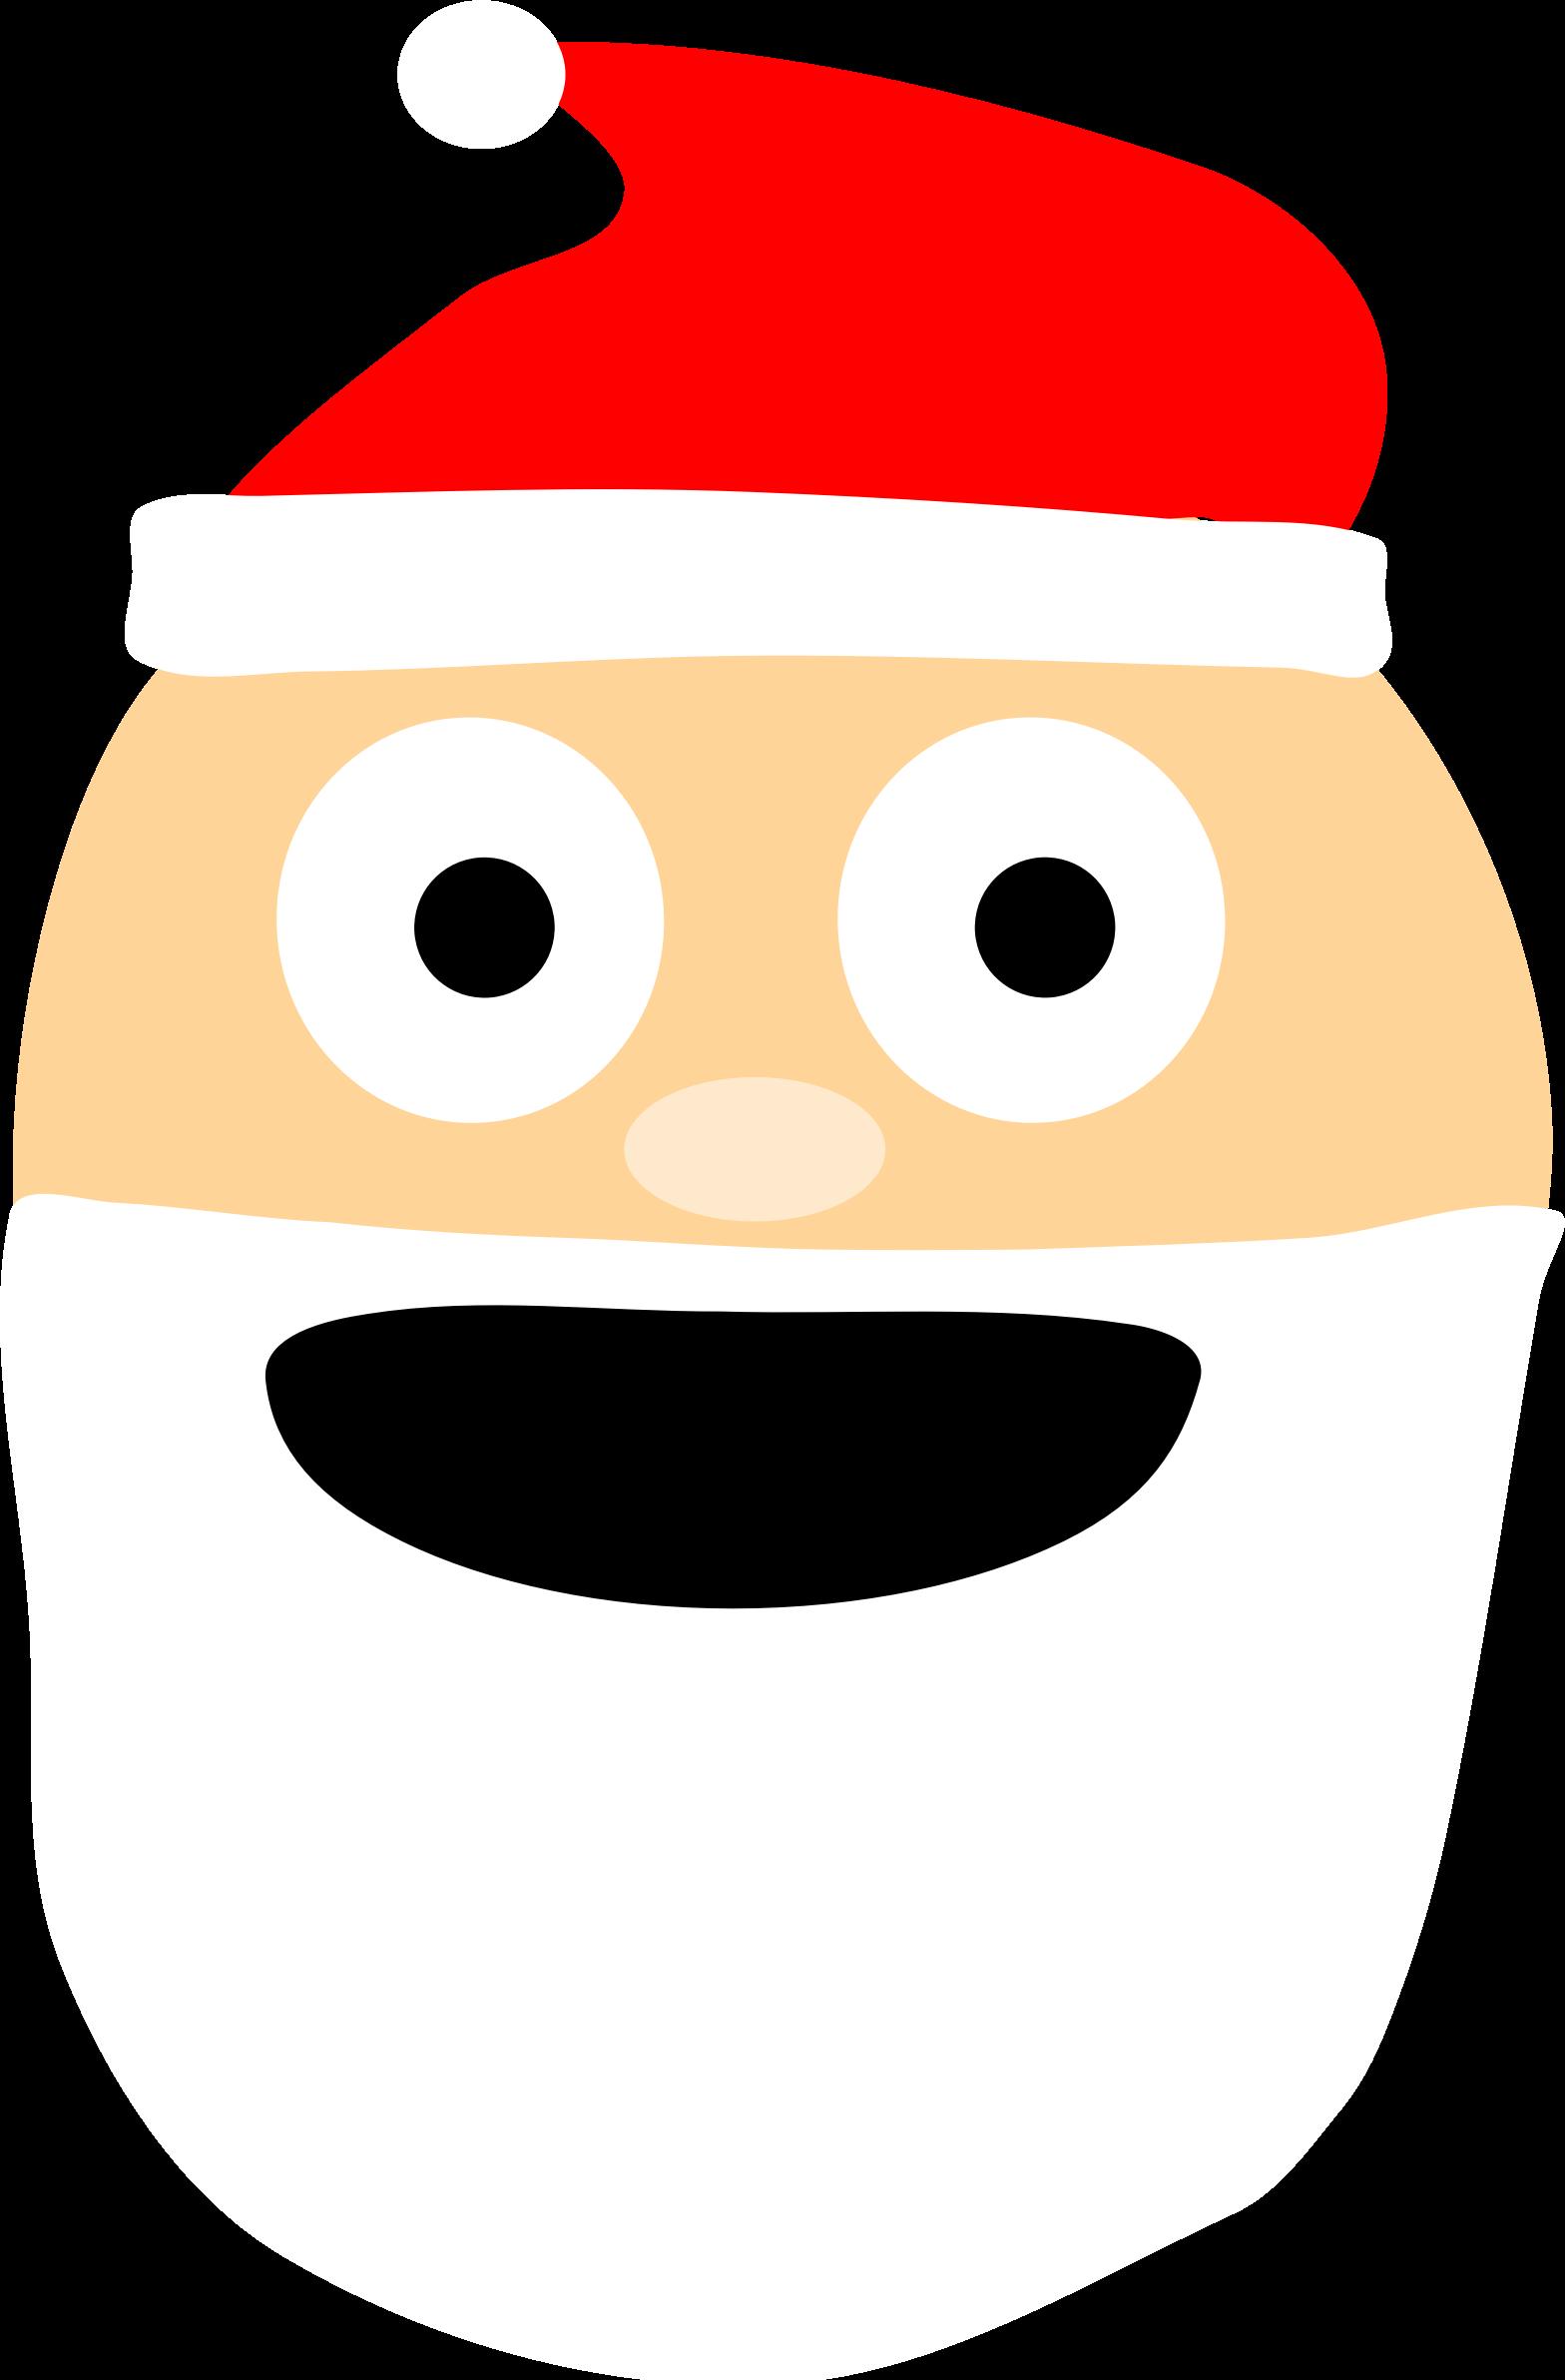 Emoji big image png. Santa clipart nose